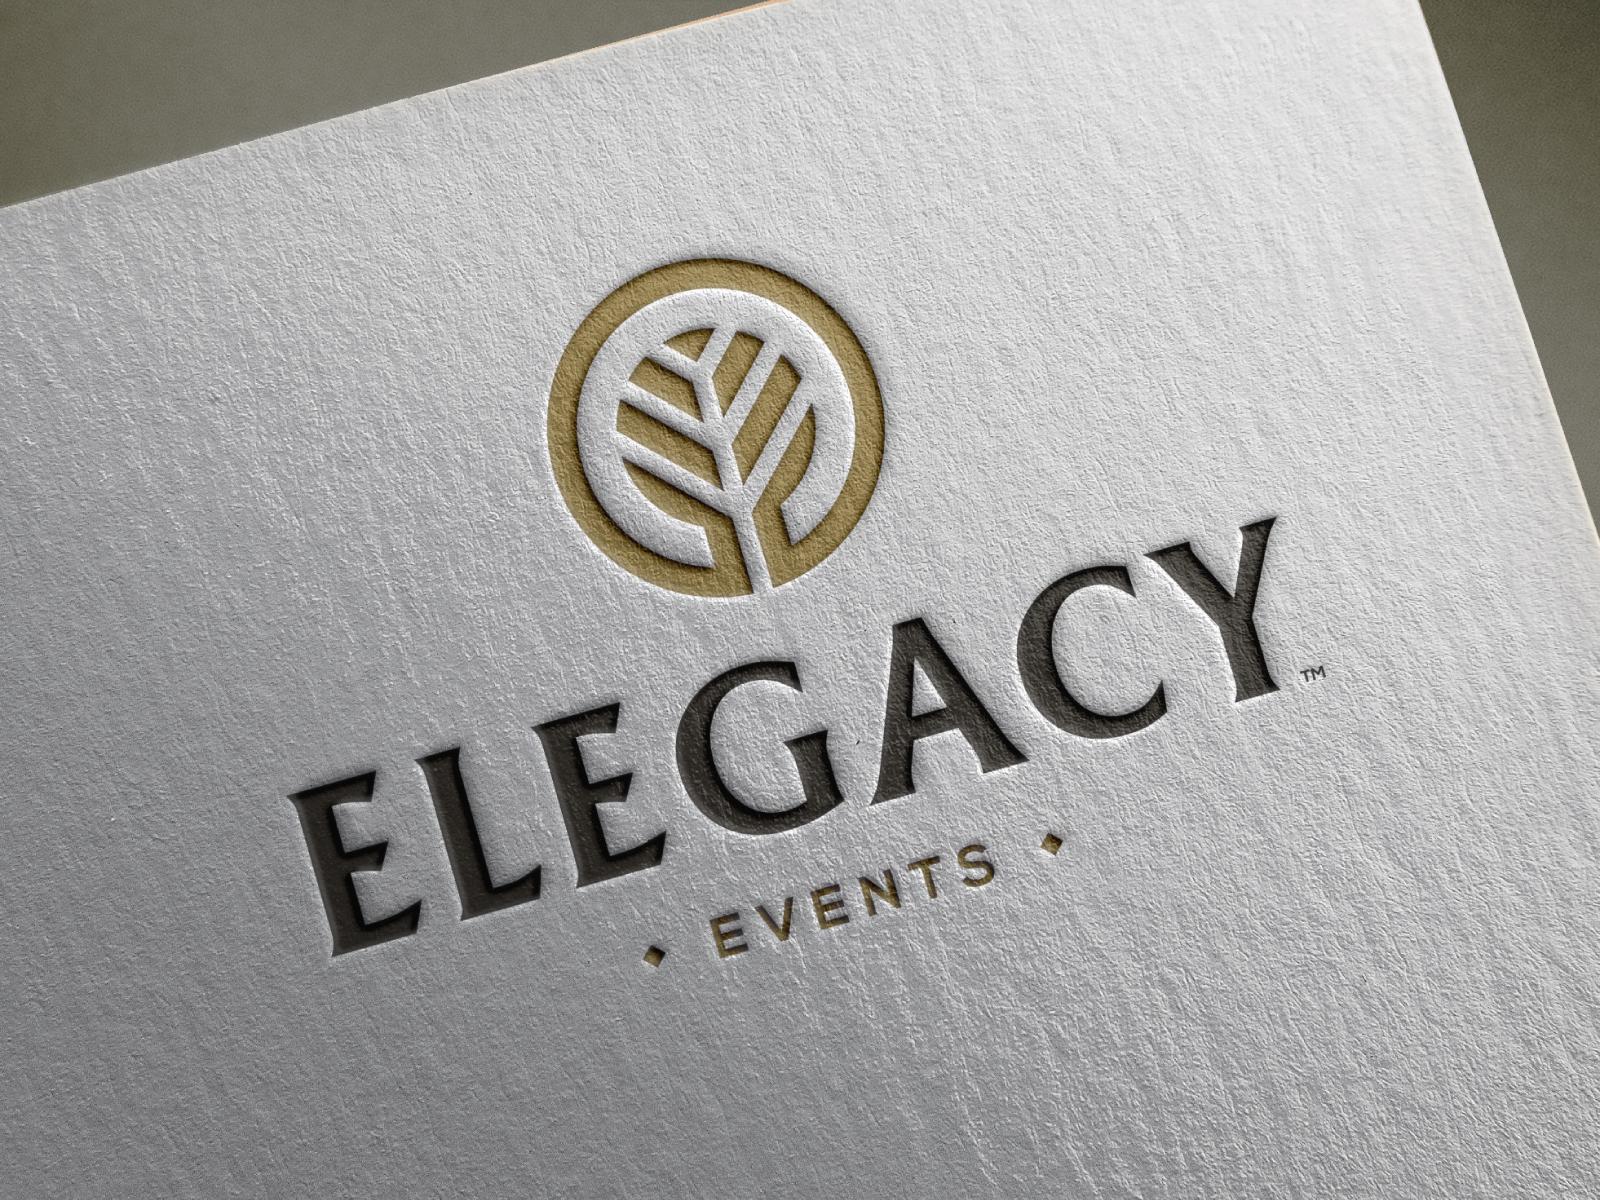 Elegacy events print